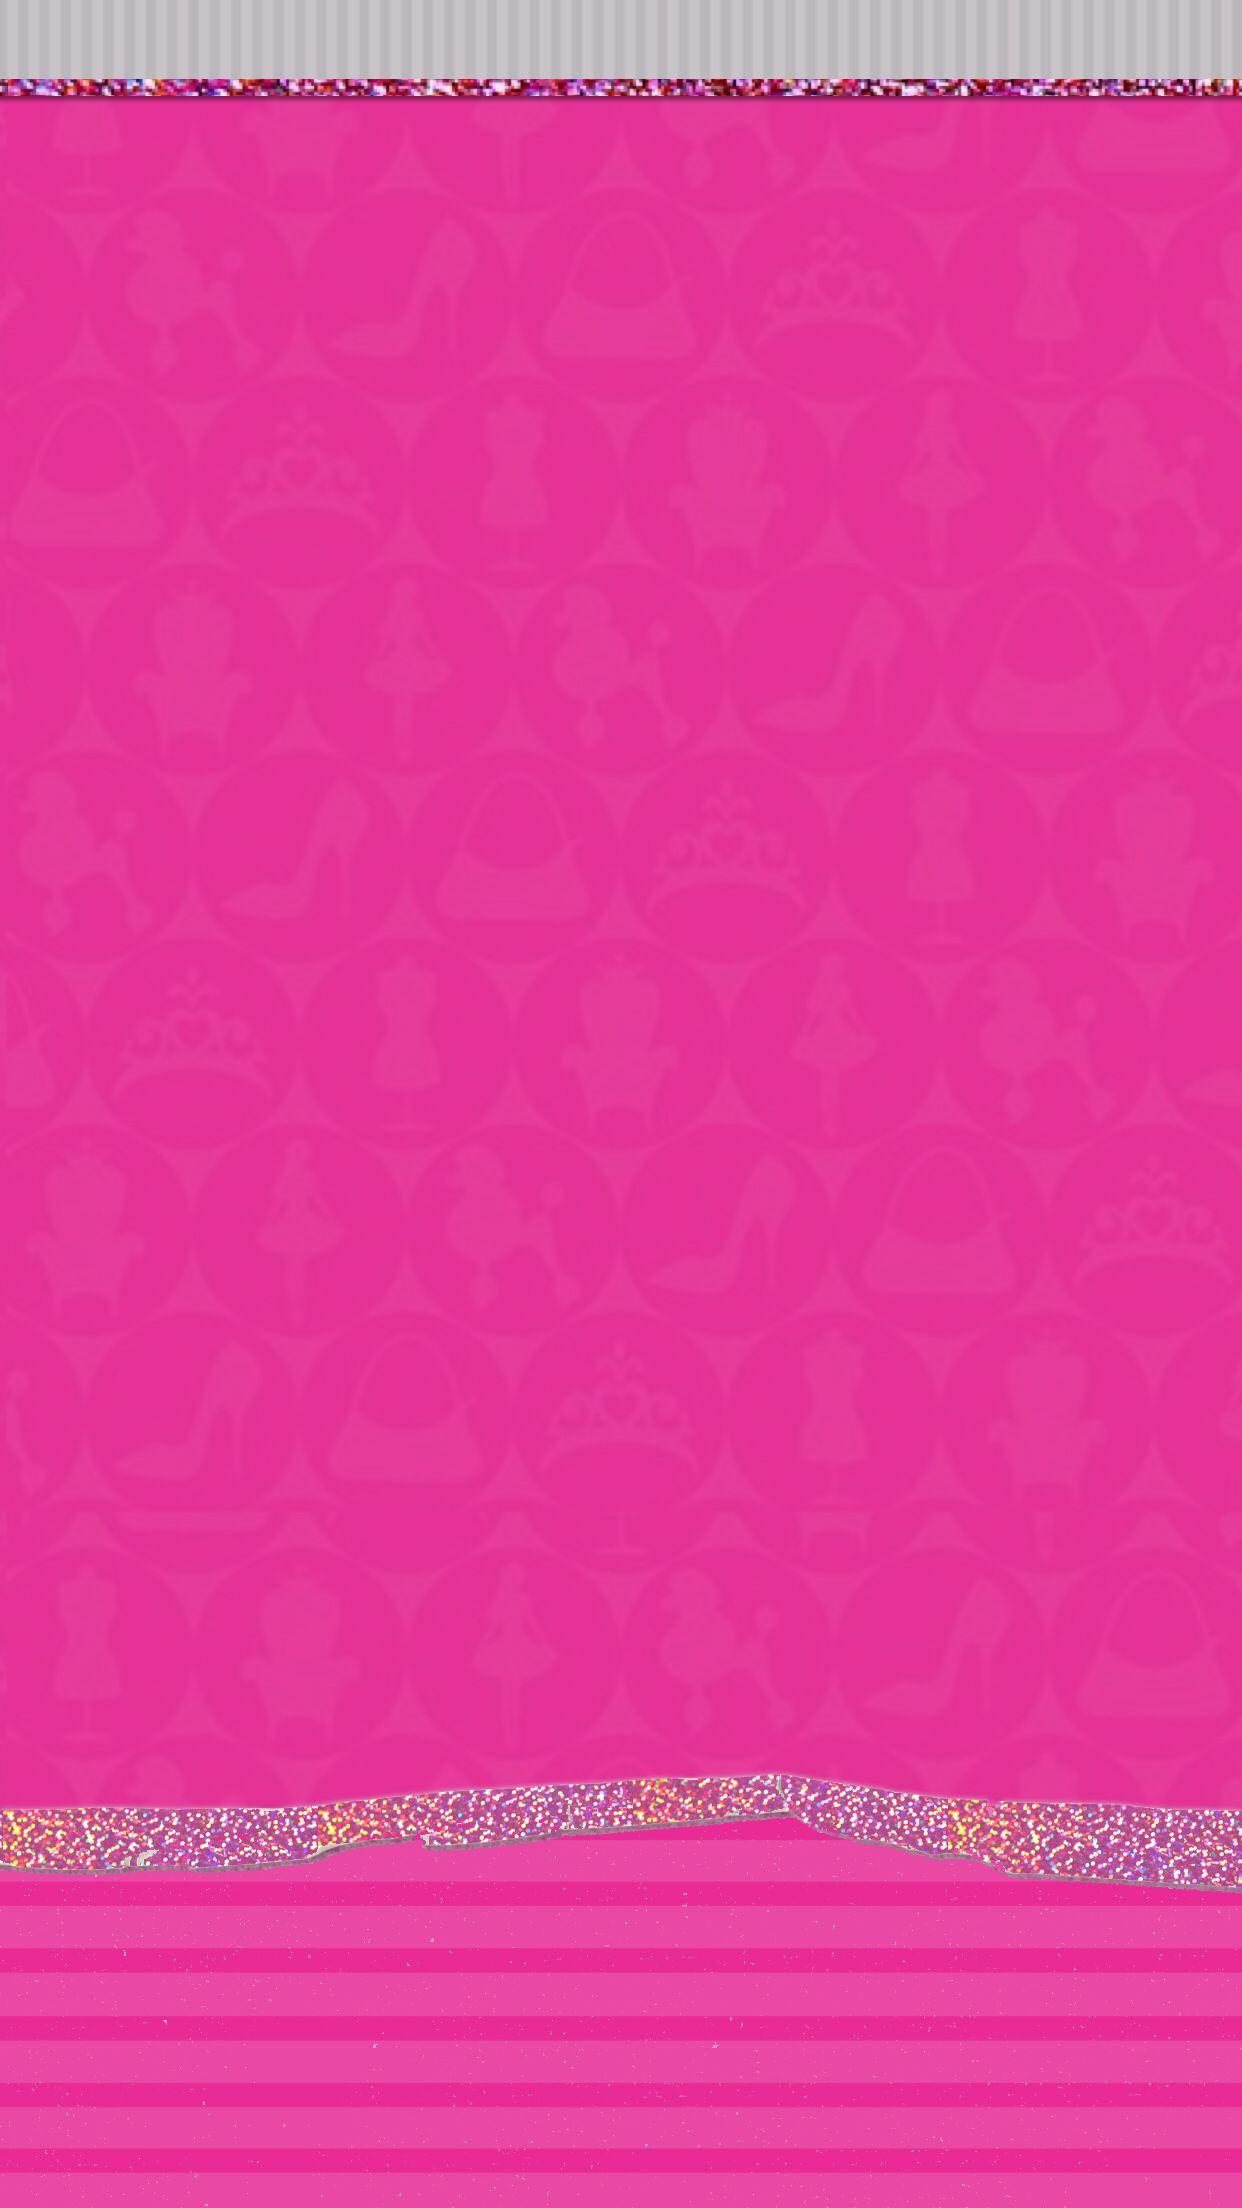 S8 Wallpaper Lock Screen Backgrounds Phone Pink Cupcakes